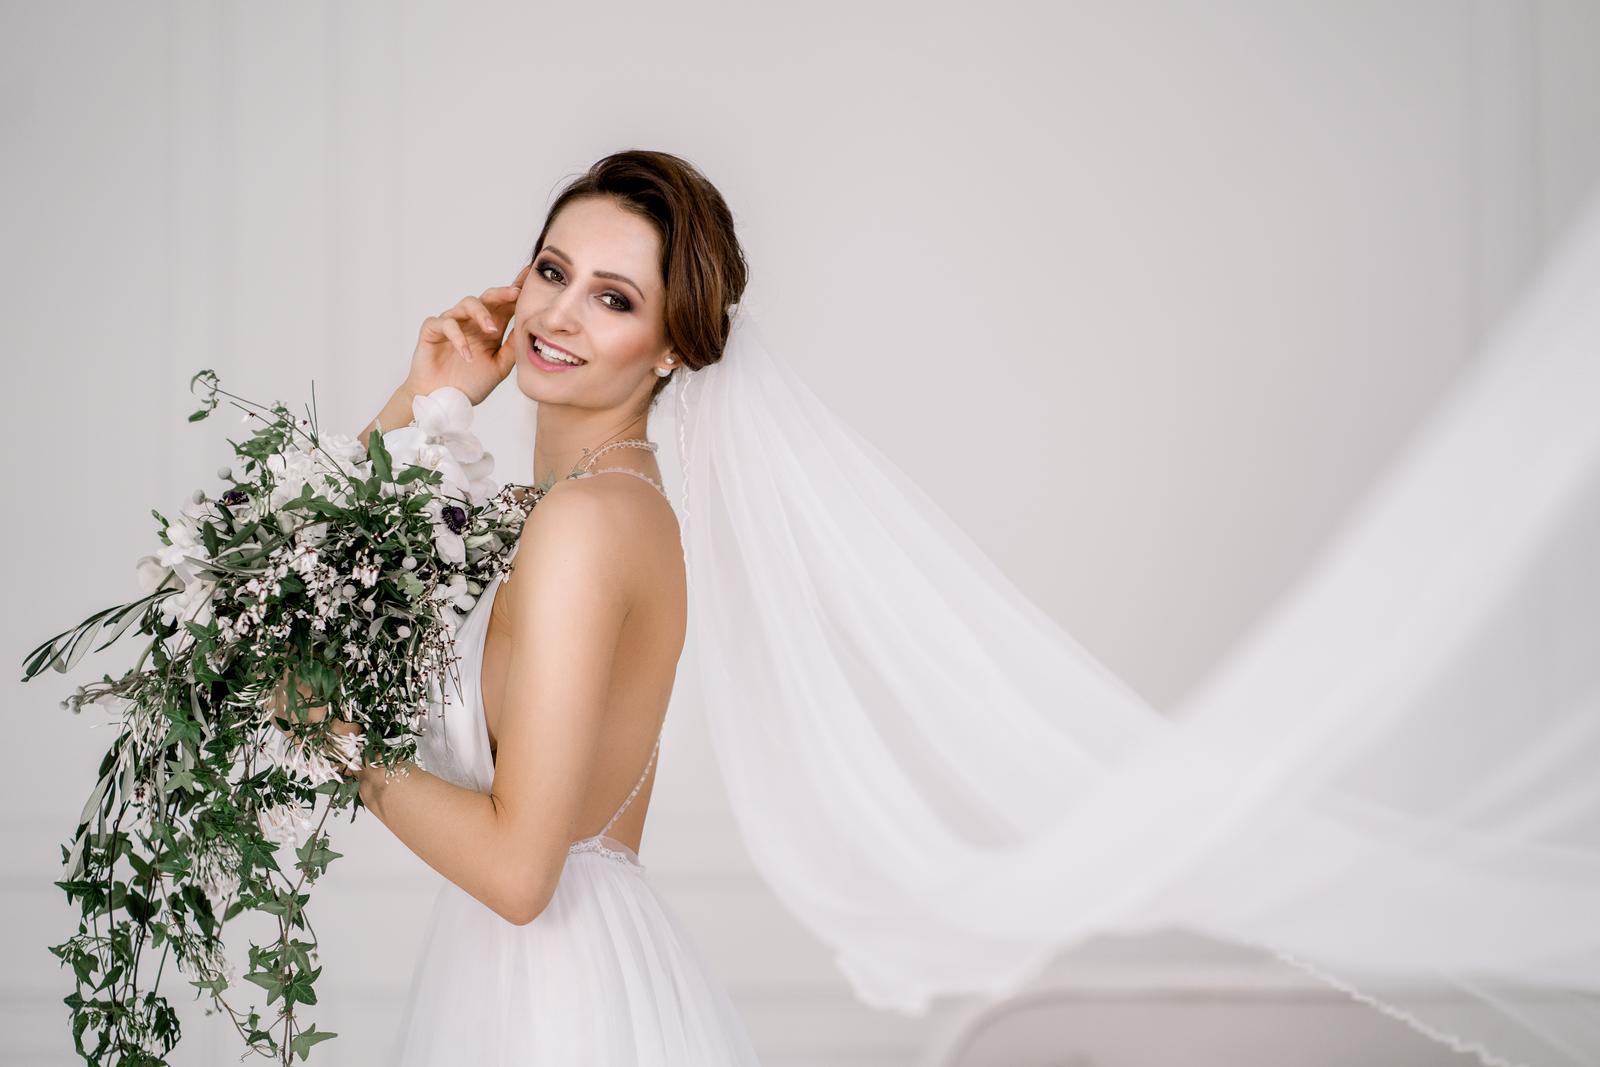 kristynaduskova_makeup - Obrázek č. 8